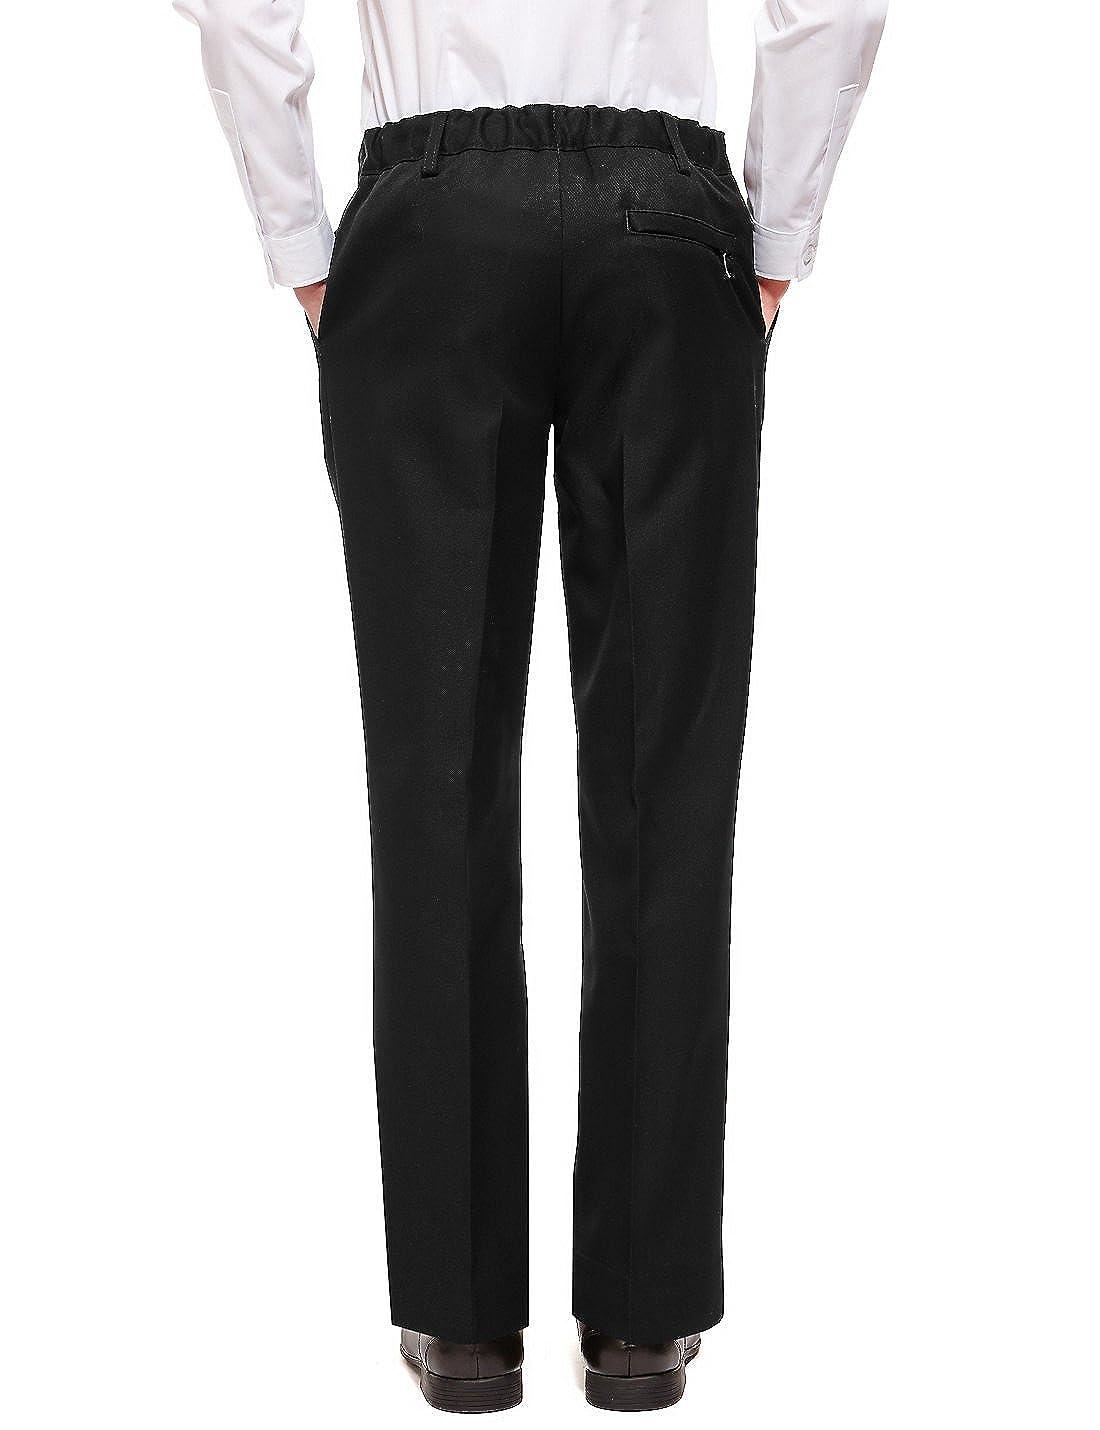 EX M/&S Boys Plus Fit School//Formal Trousers Generous Size Sturdy Short Leg Wider Adjustable Waist 2-16 Yrs Black Grey